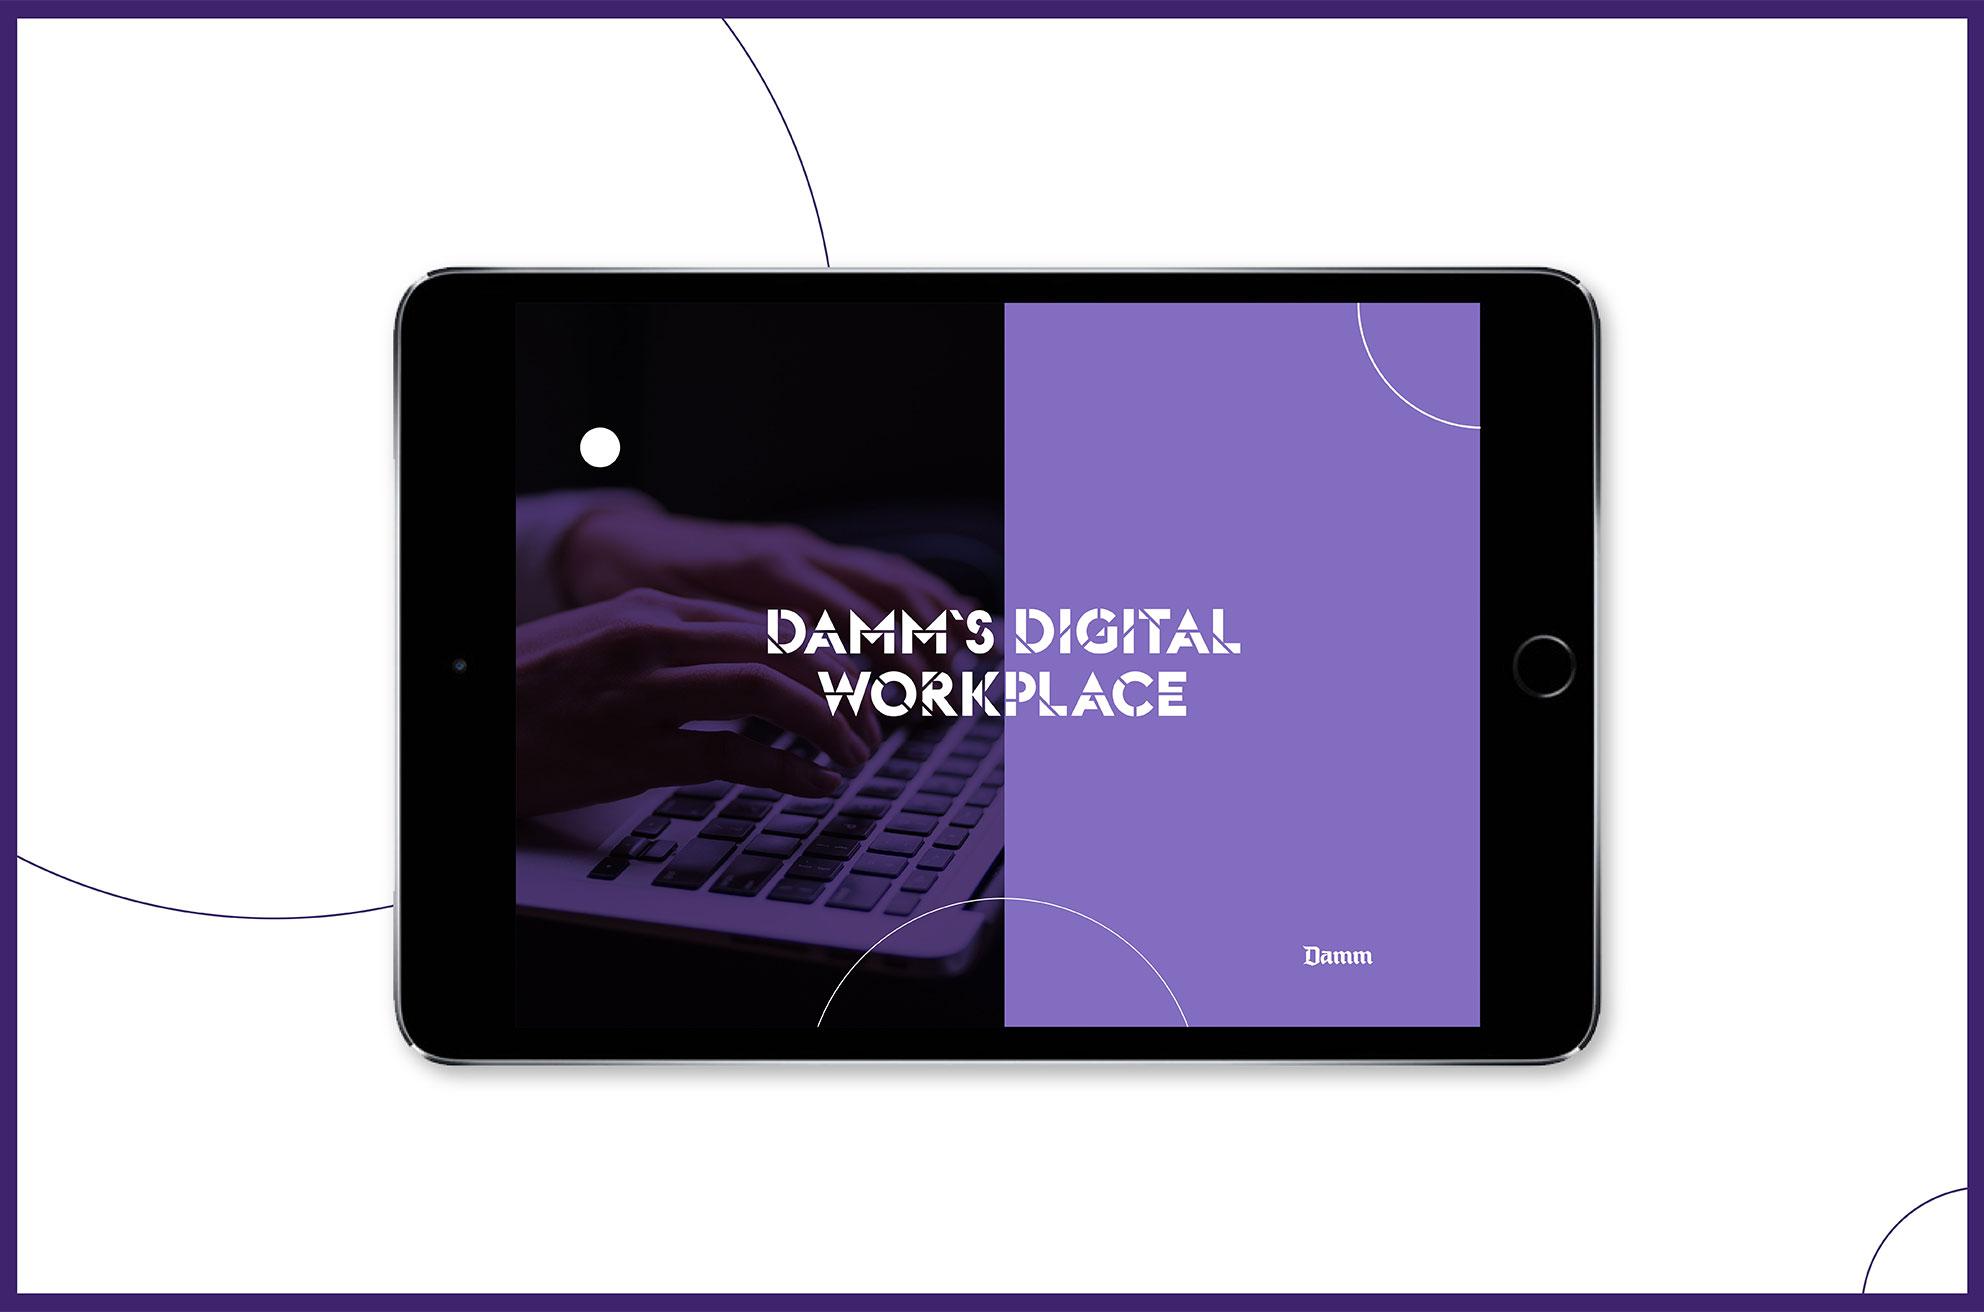 Damm-Digital-Workplace-Damm-diseñografico-agencia-barcelona-1